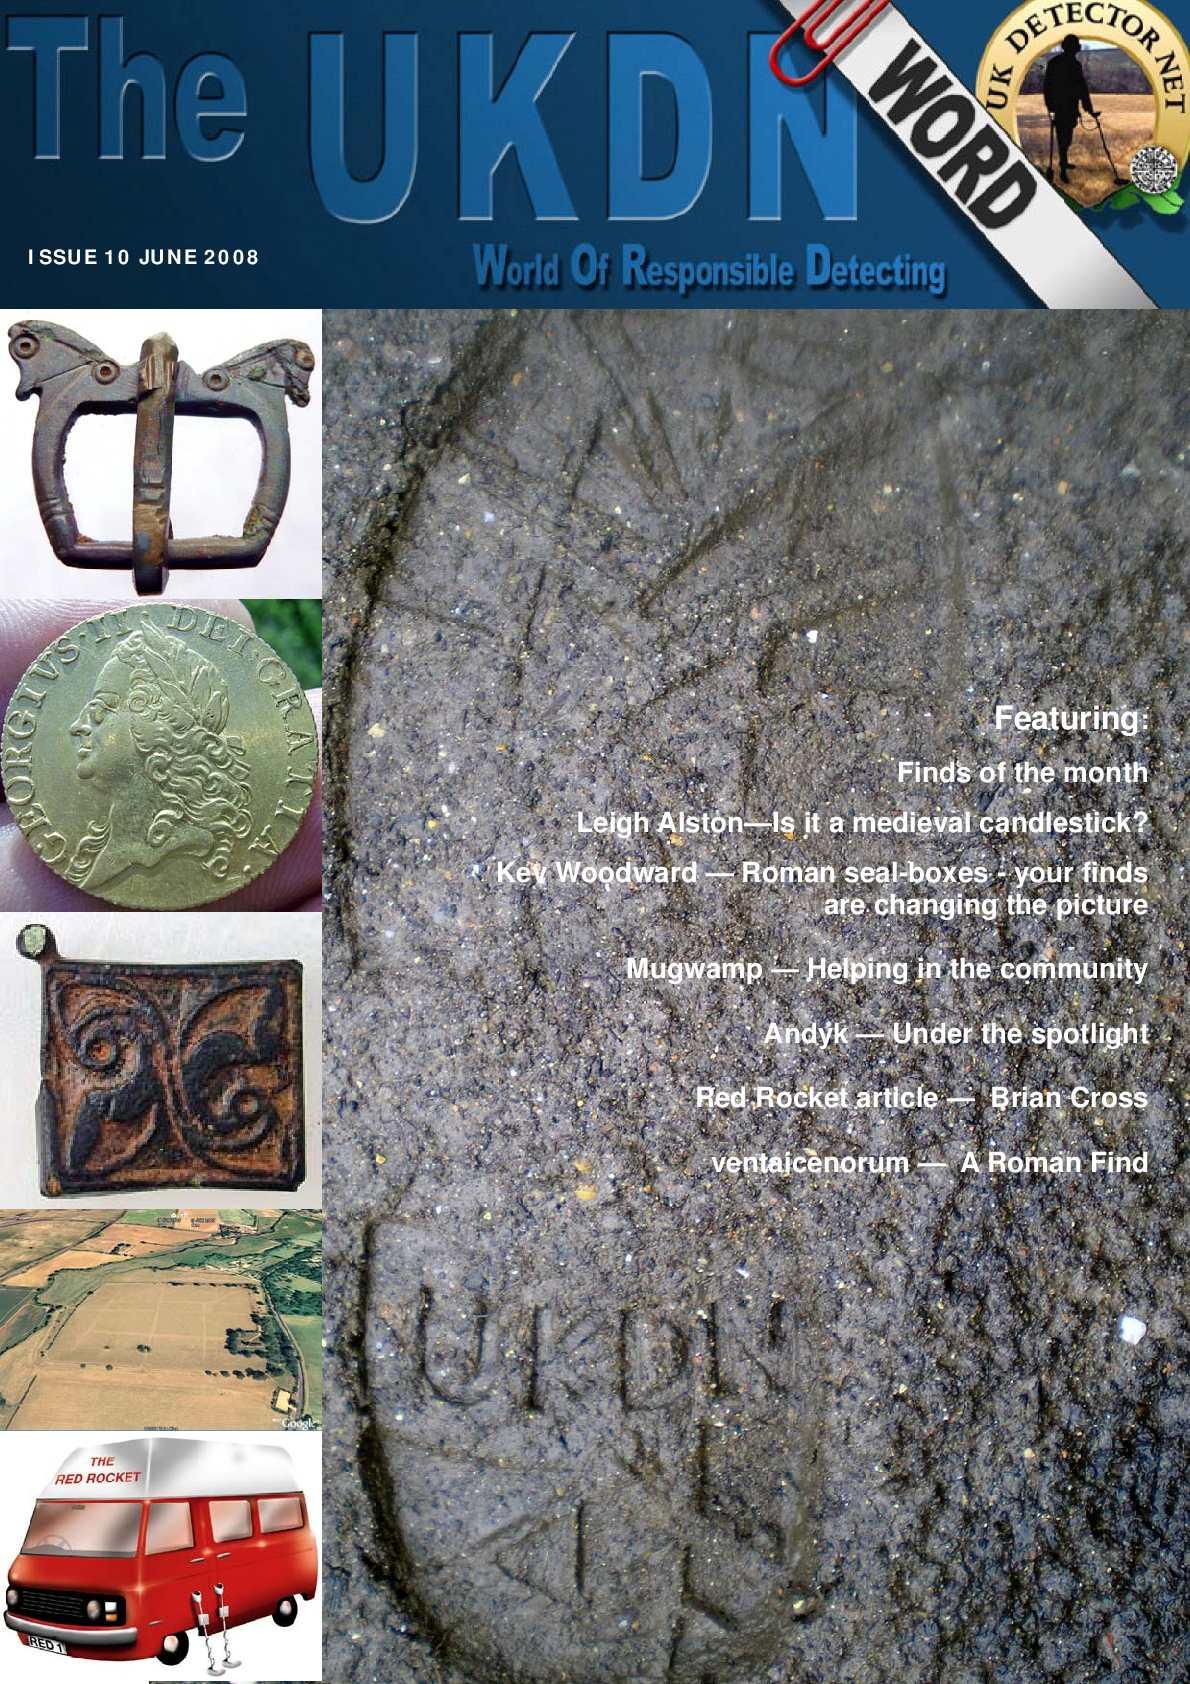 UKDN Word Issue 10 June 2008